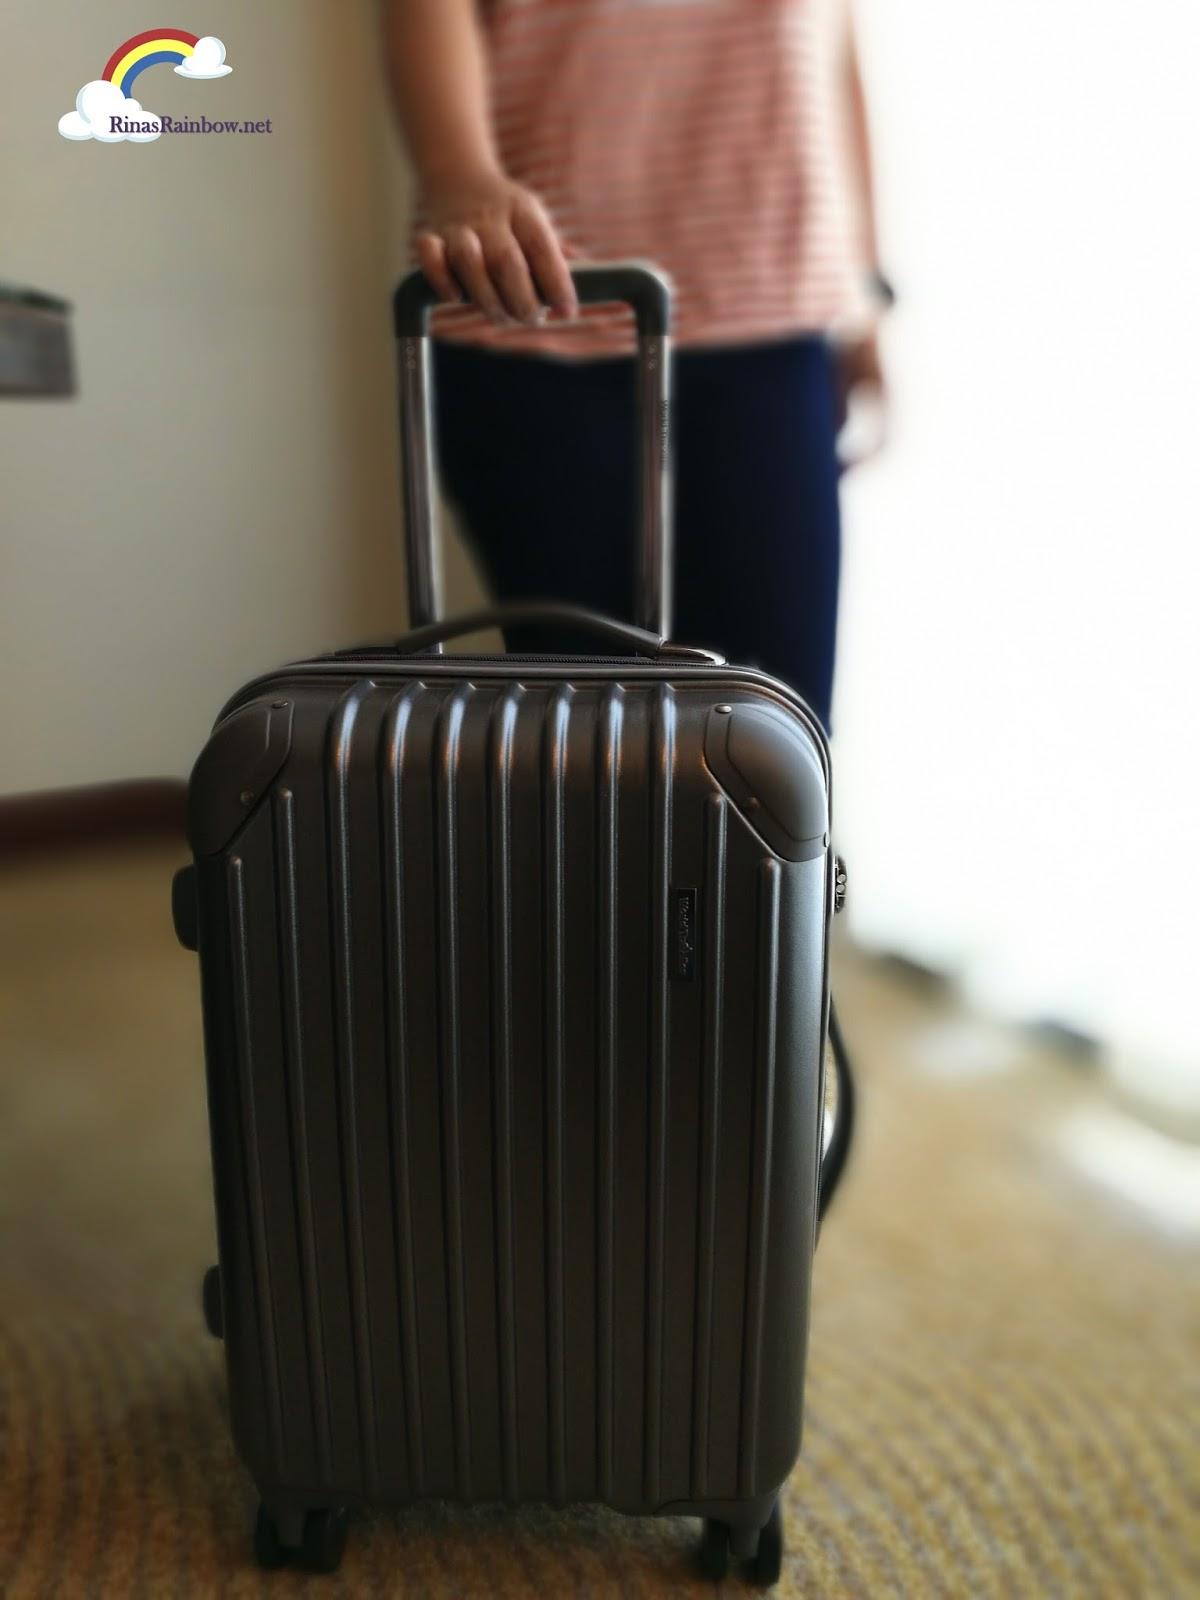 Rina's Rainbow: Free World Traveller Luggage for Cebu Pacific ...